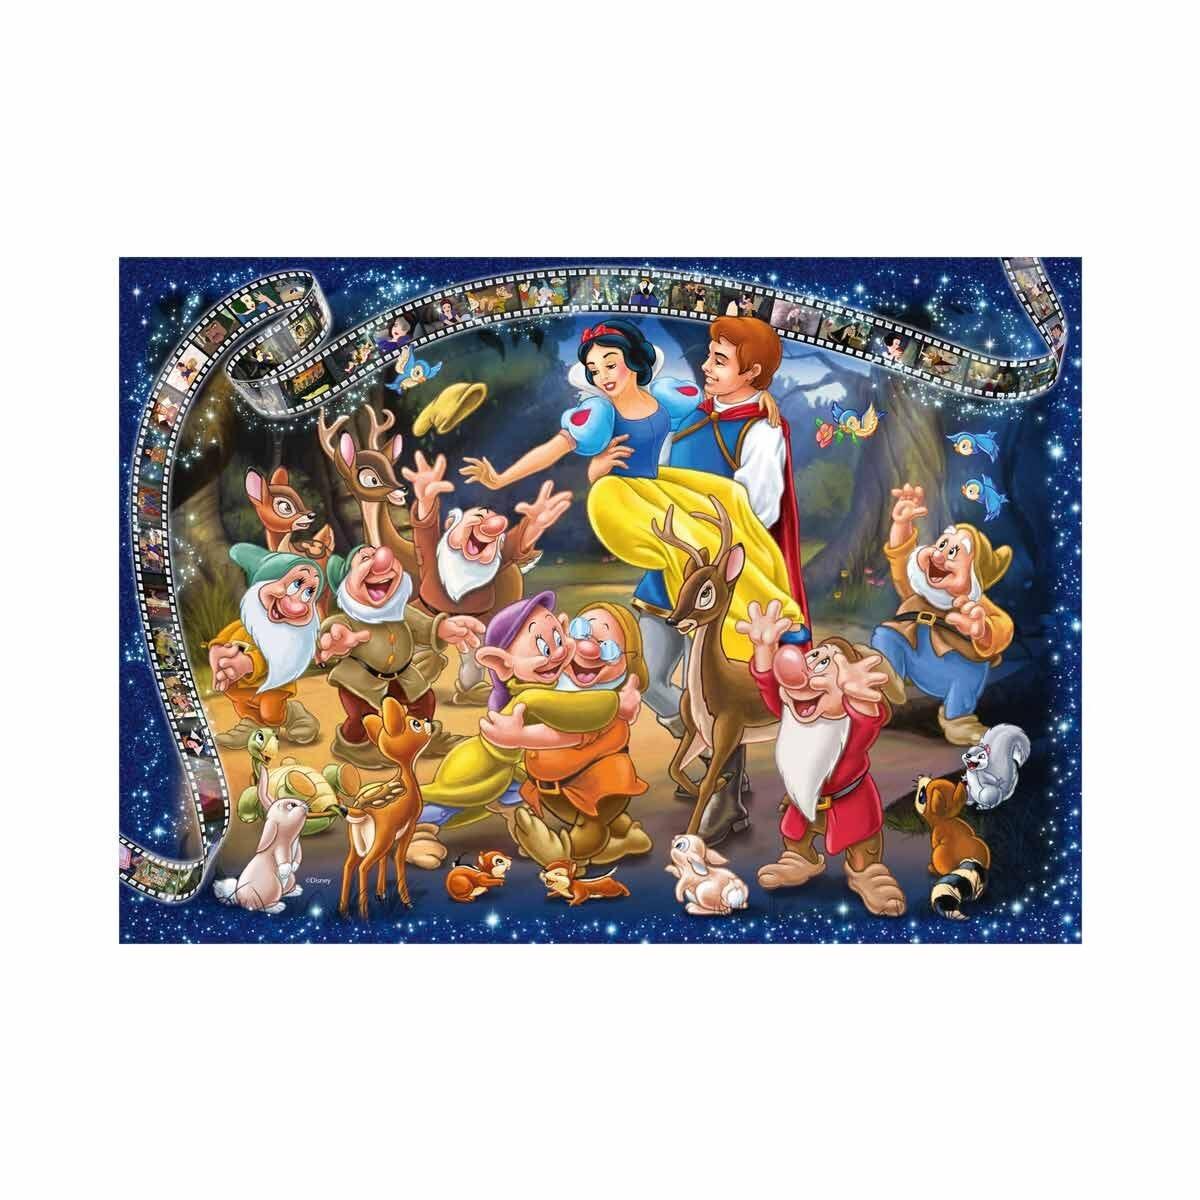 Ravensburger Disney Collectors Edition Snow White 1000 Piece Jigsaw Puzzle